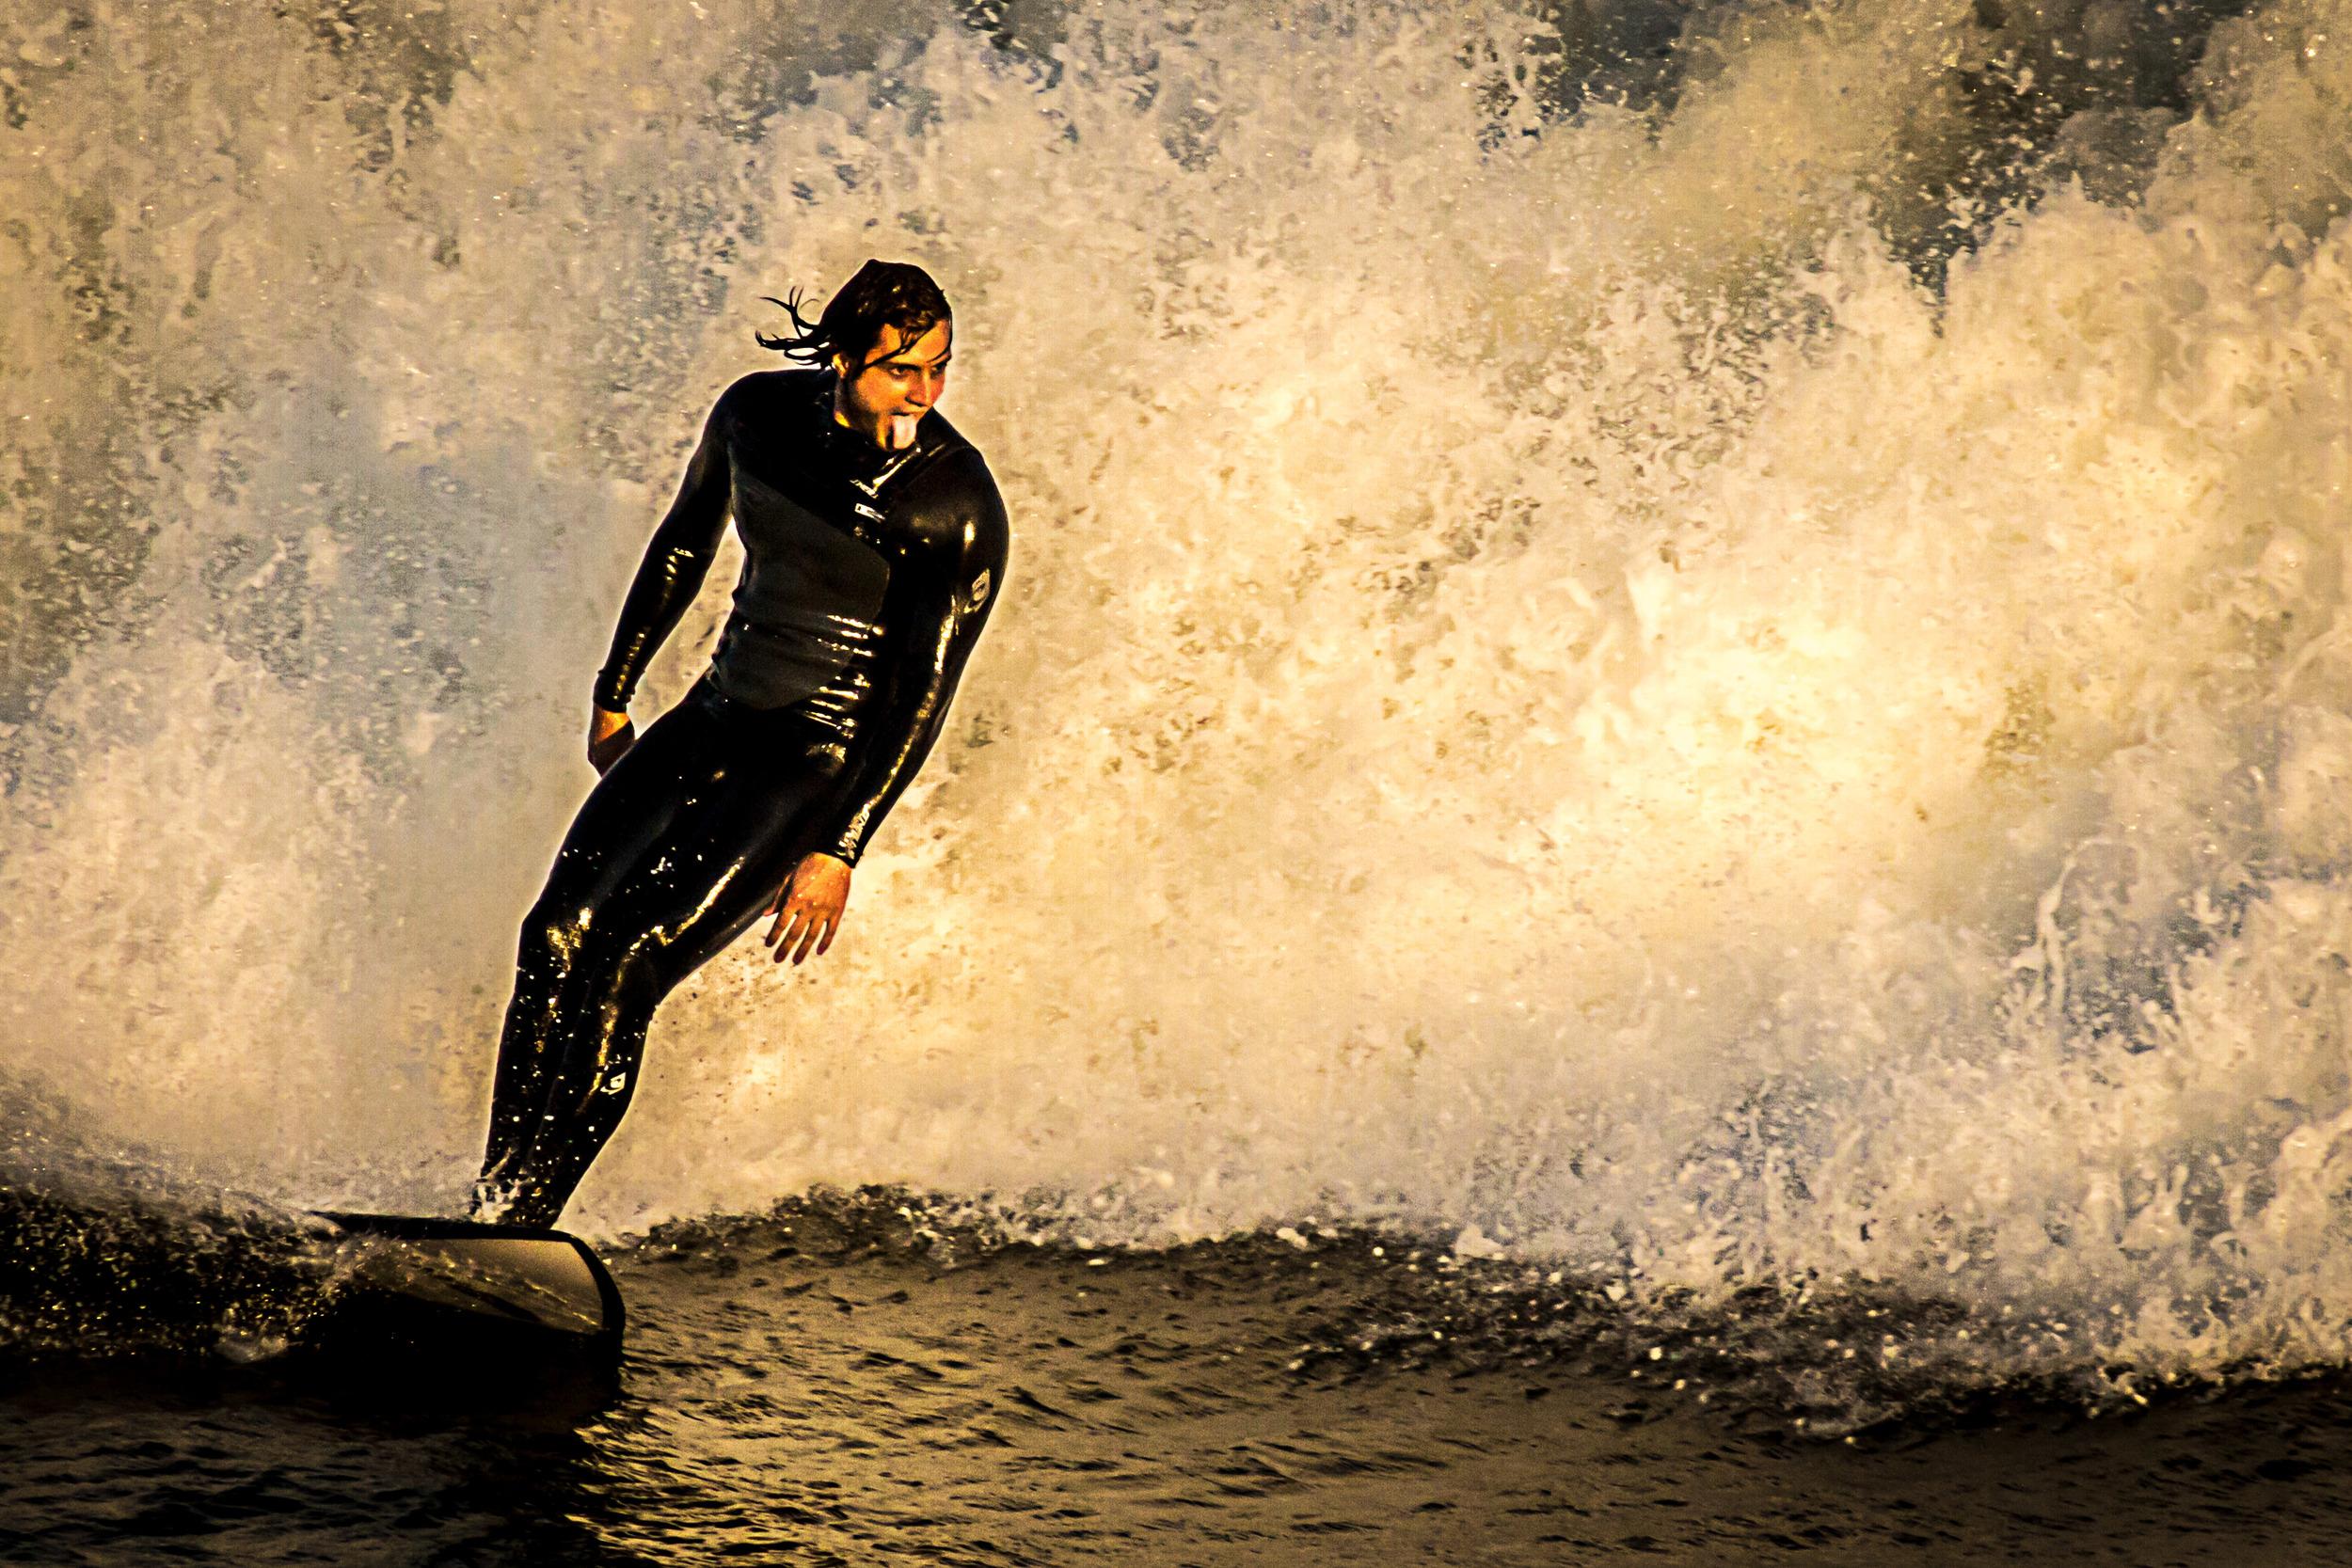 Surf Celebration